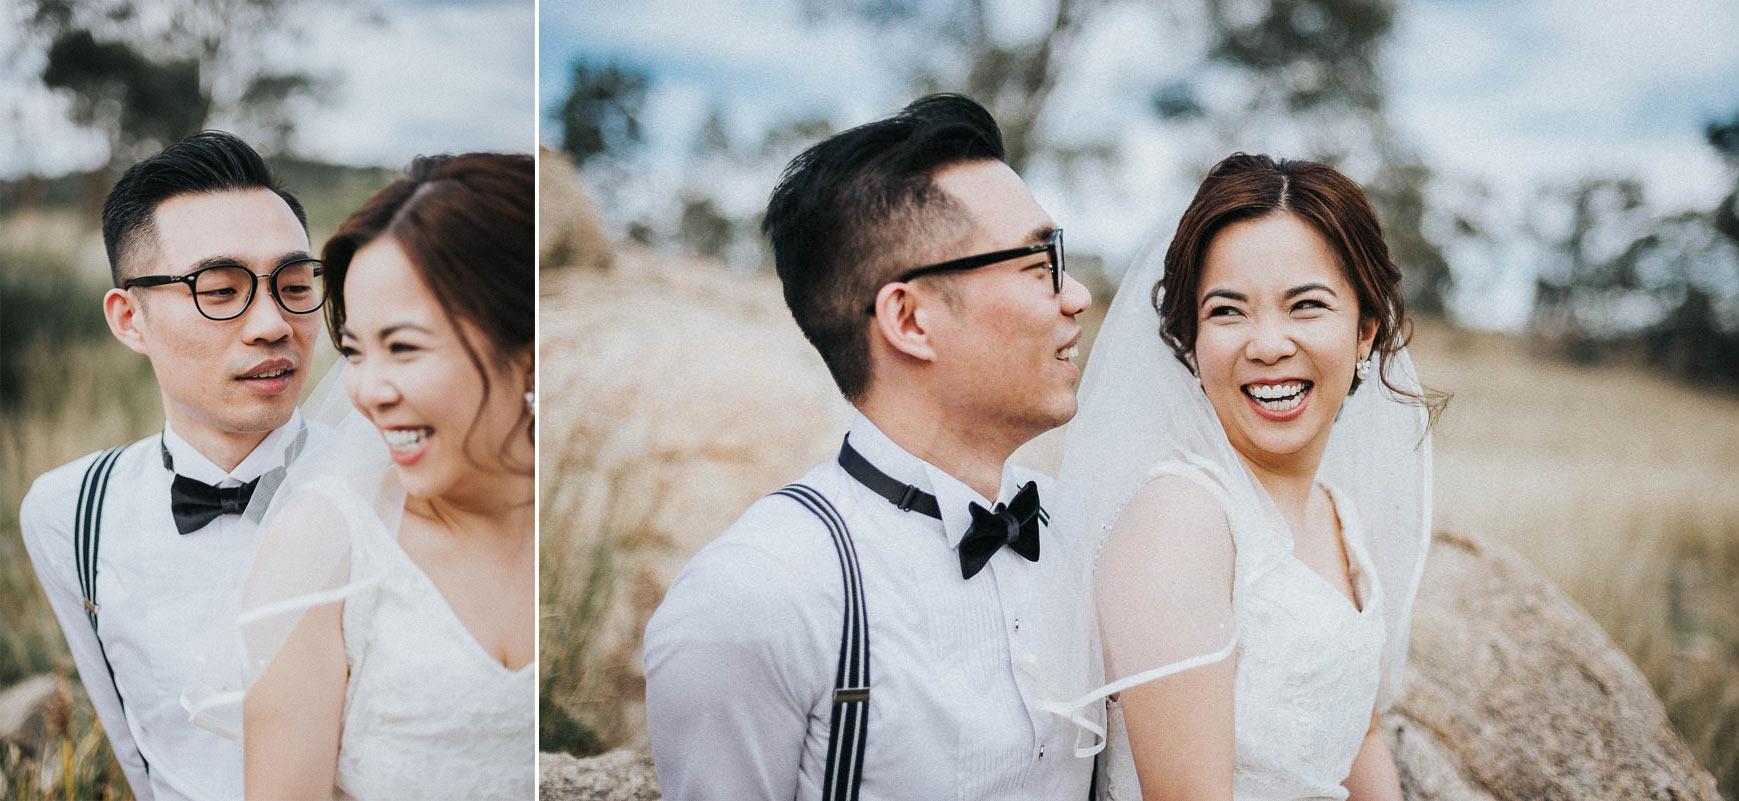 hong-kong-perth-wedding-photographer-50.jpg